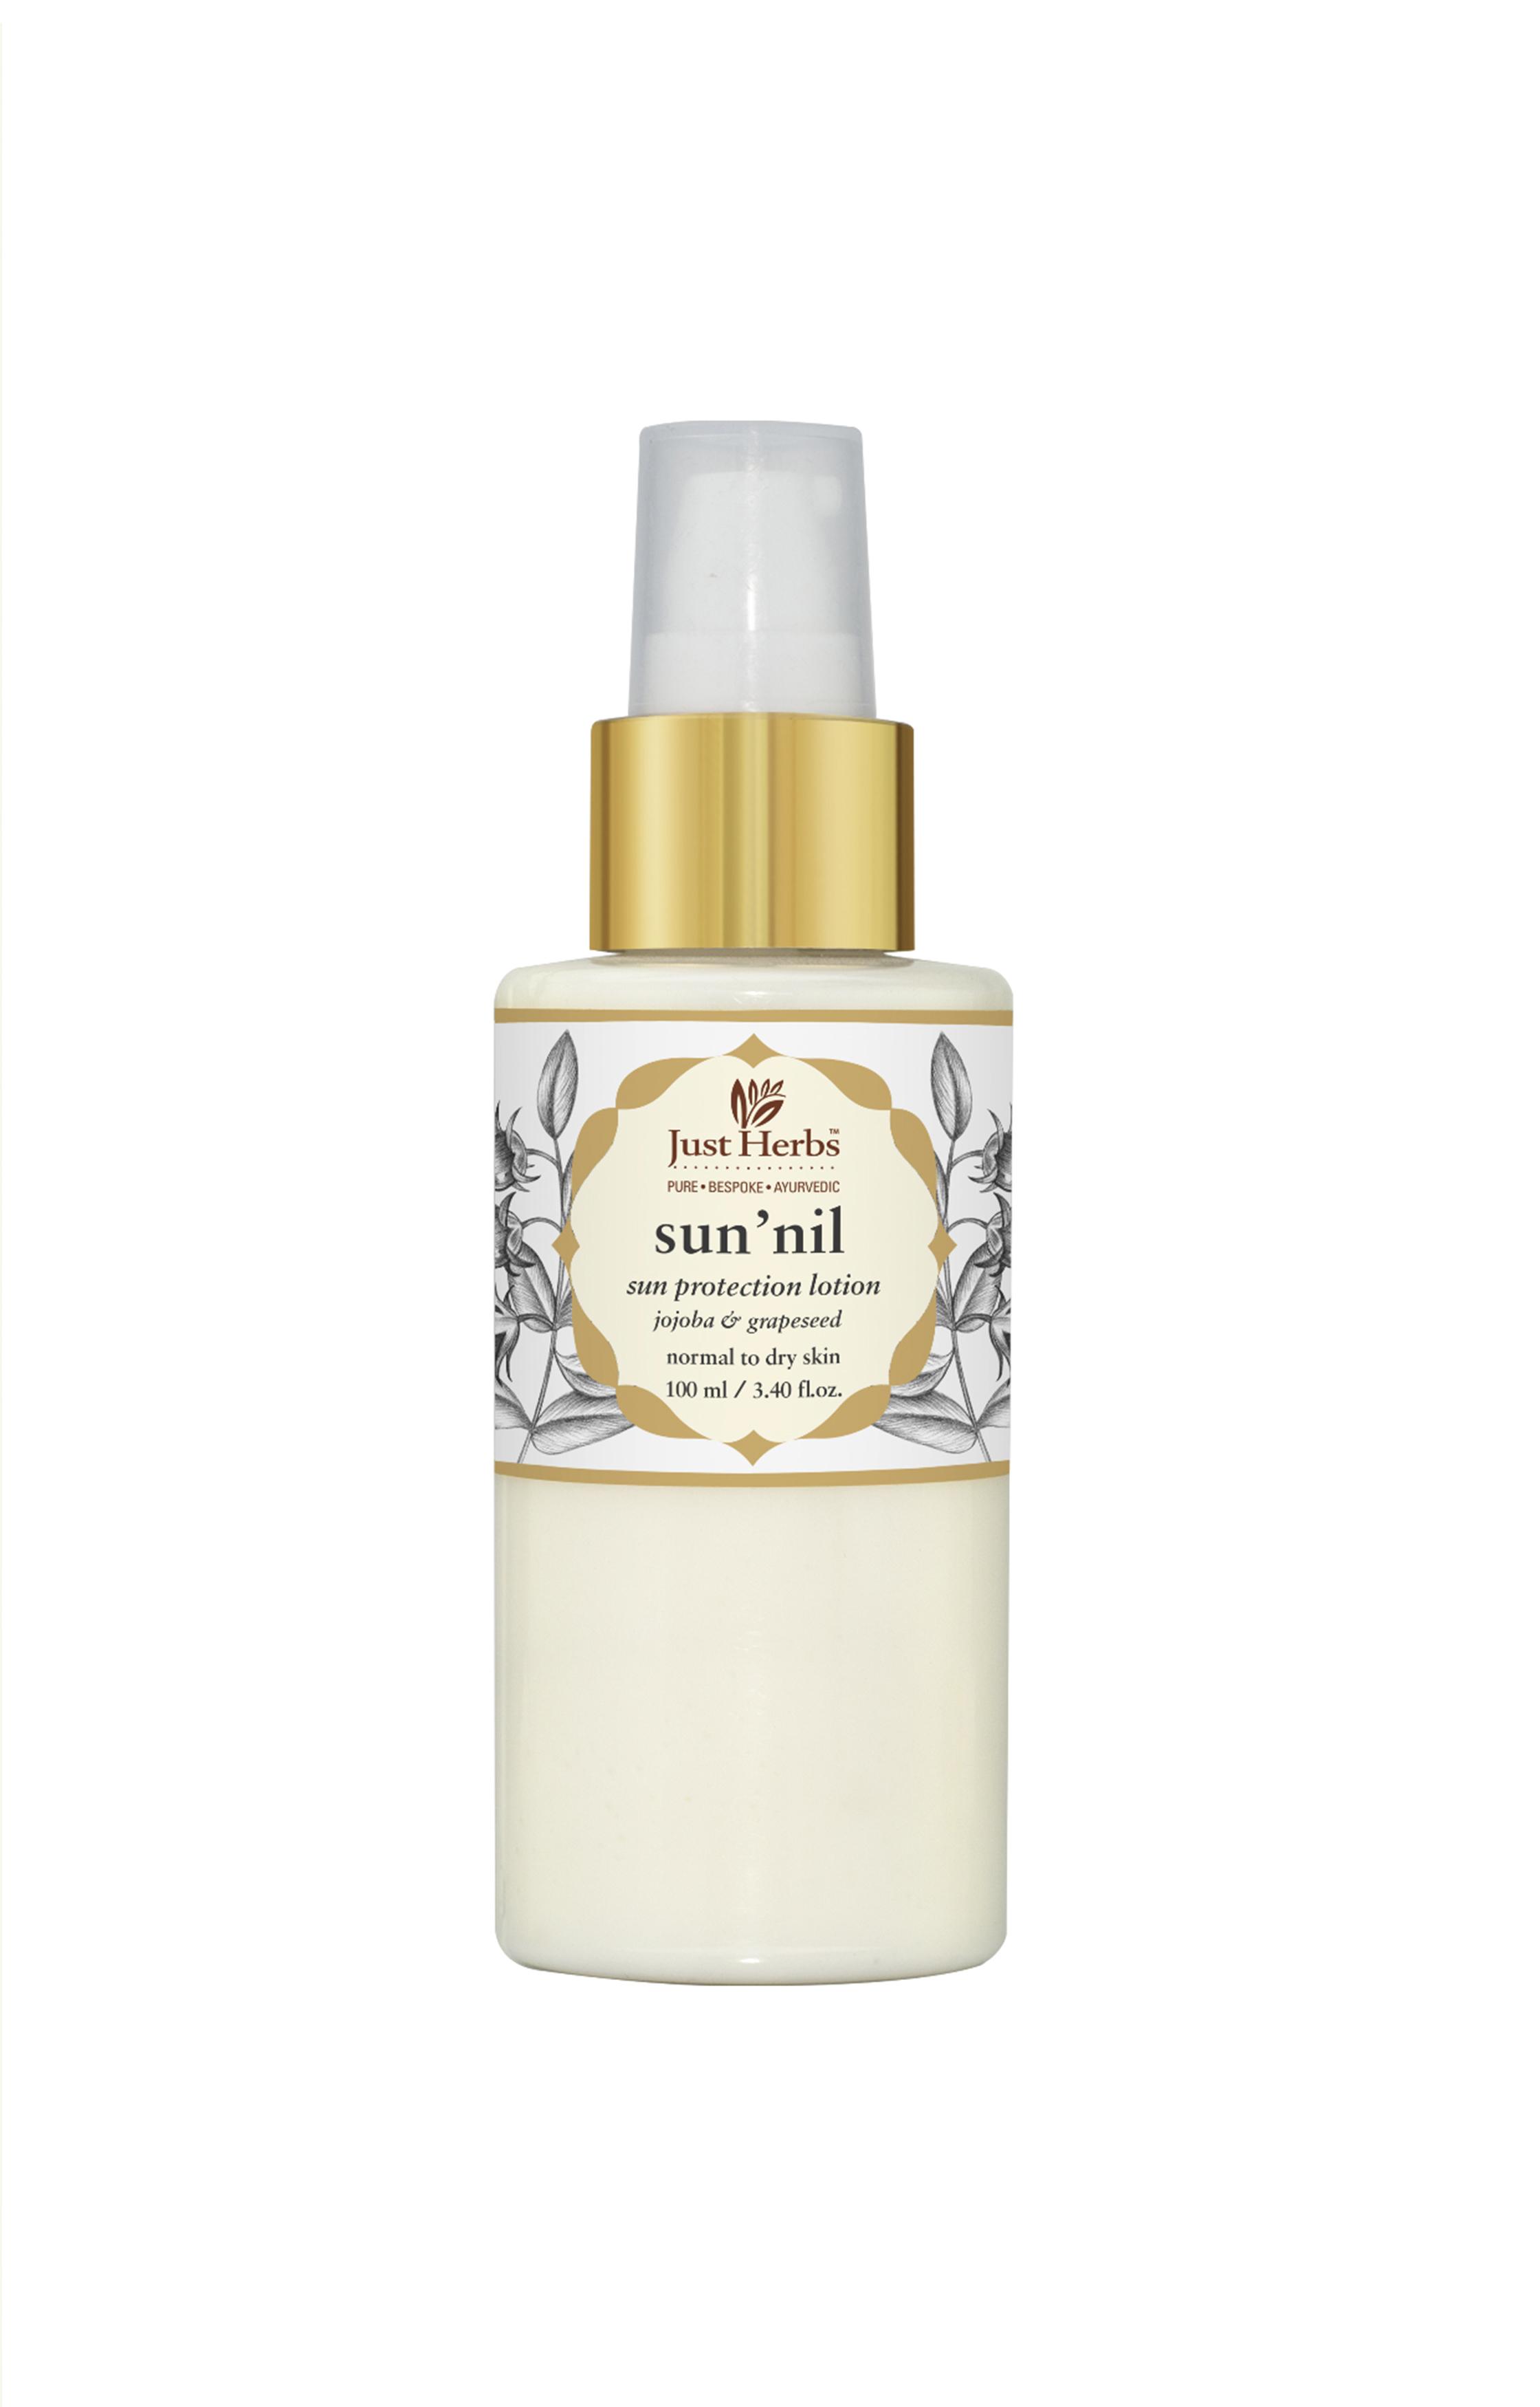 Just Herbs | Sun'nil Jojoba-Grapeseed Moisturising Sun Protection Lotion